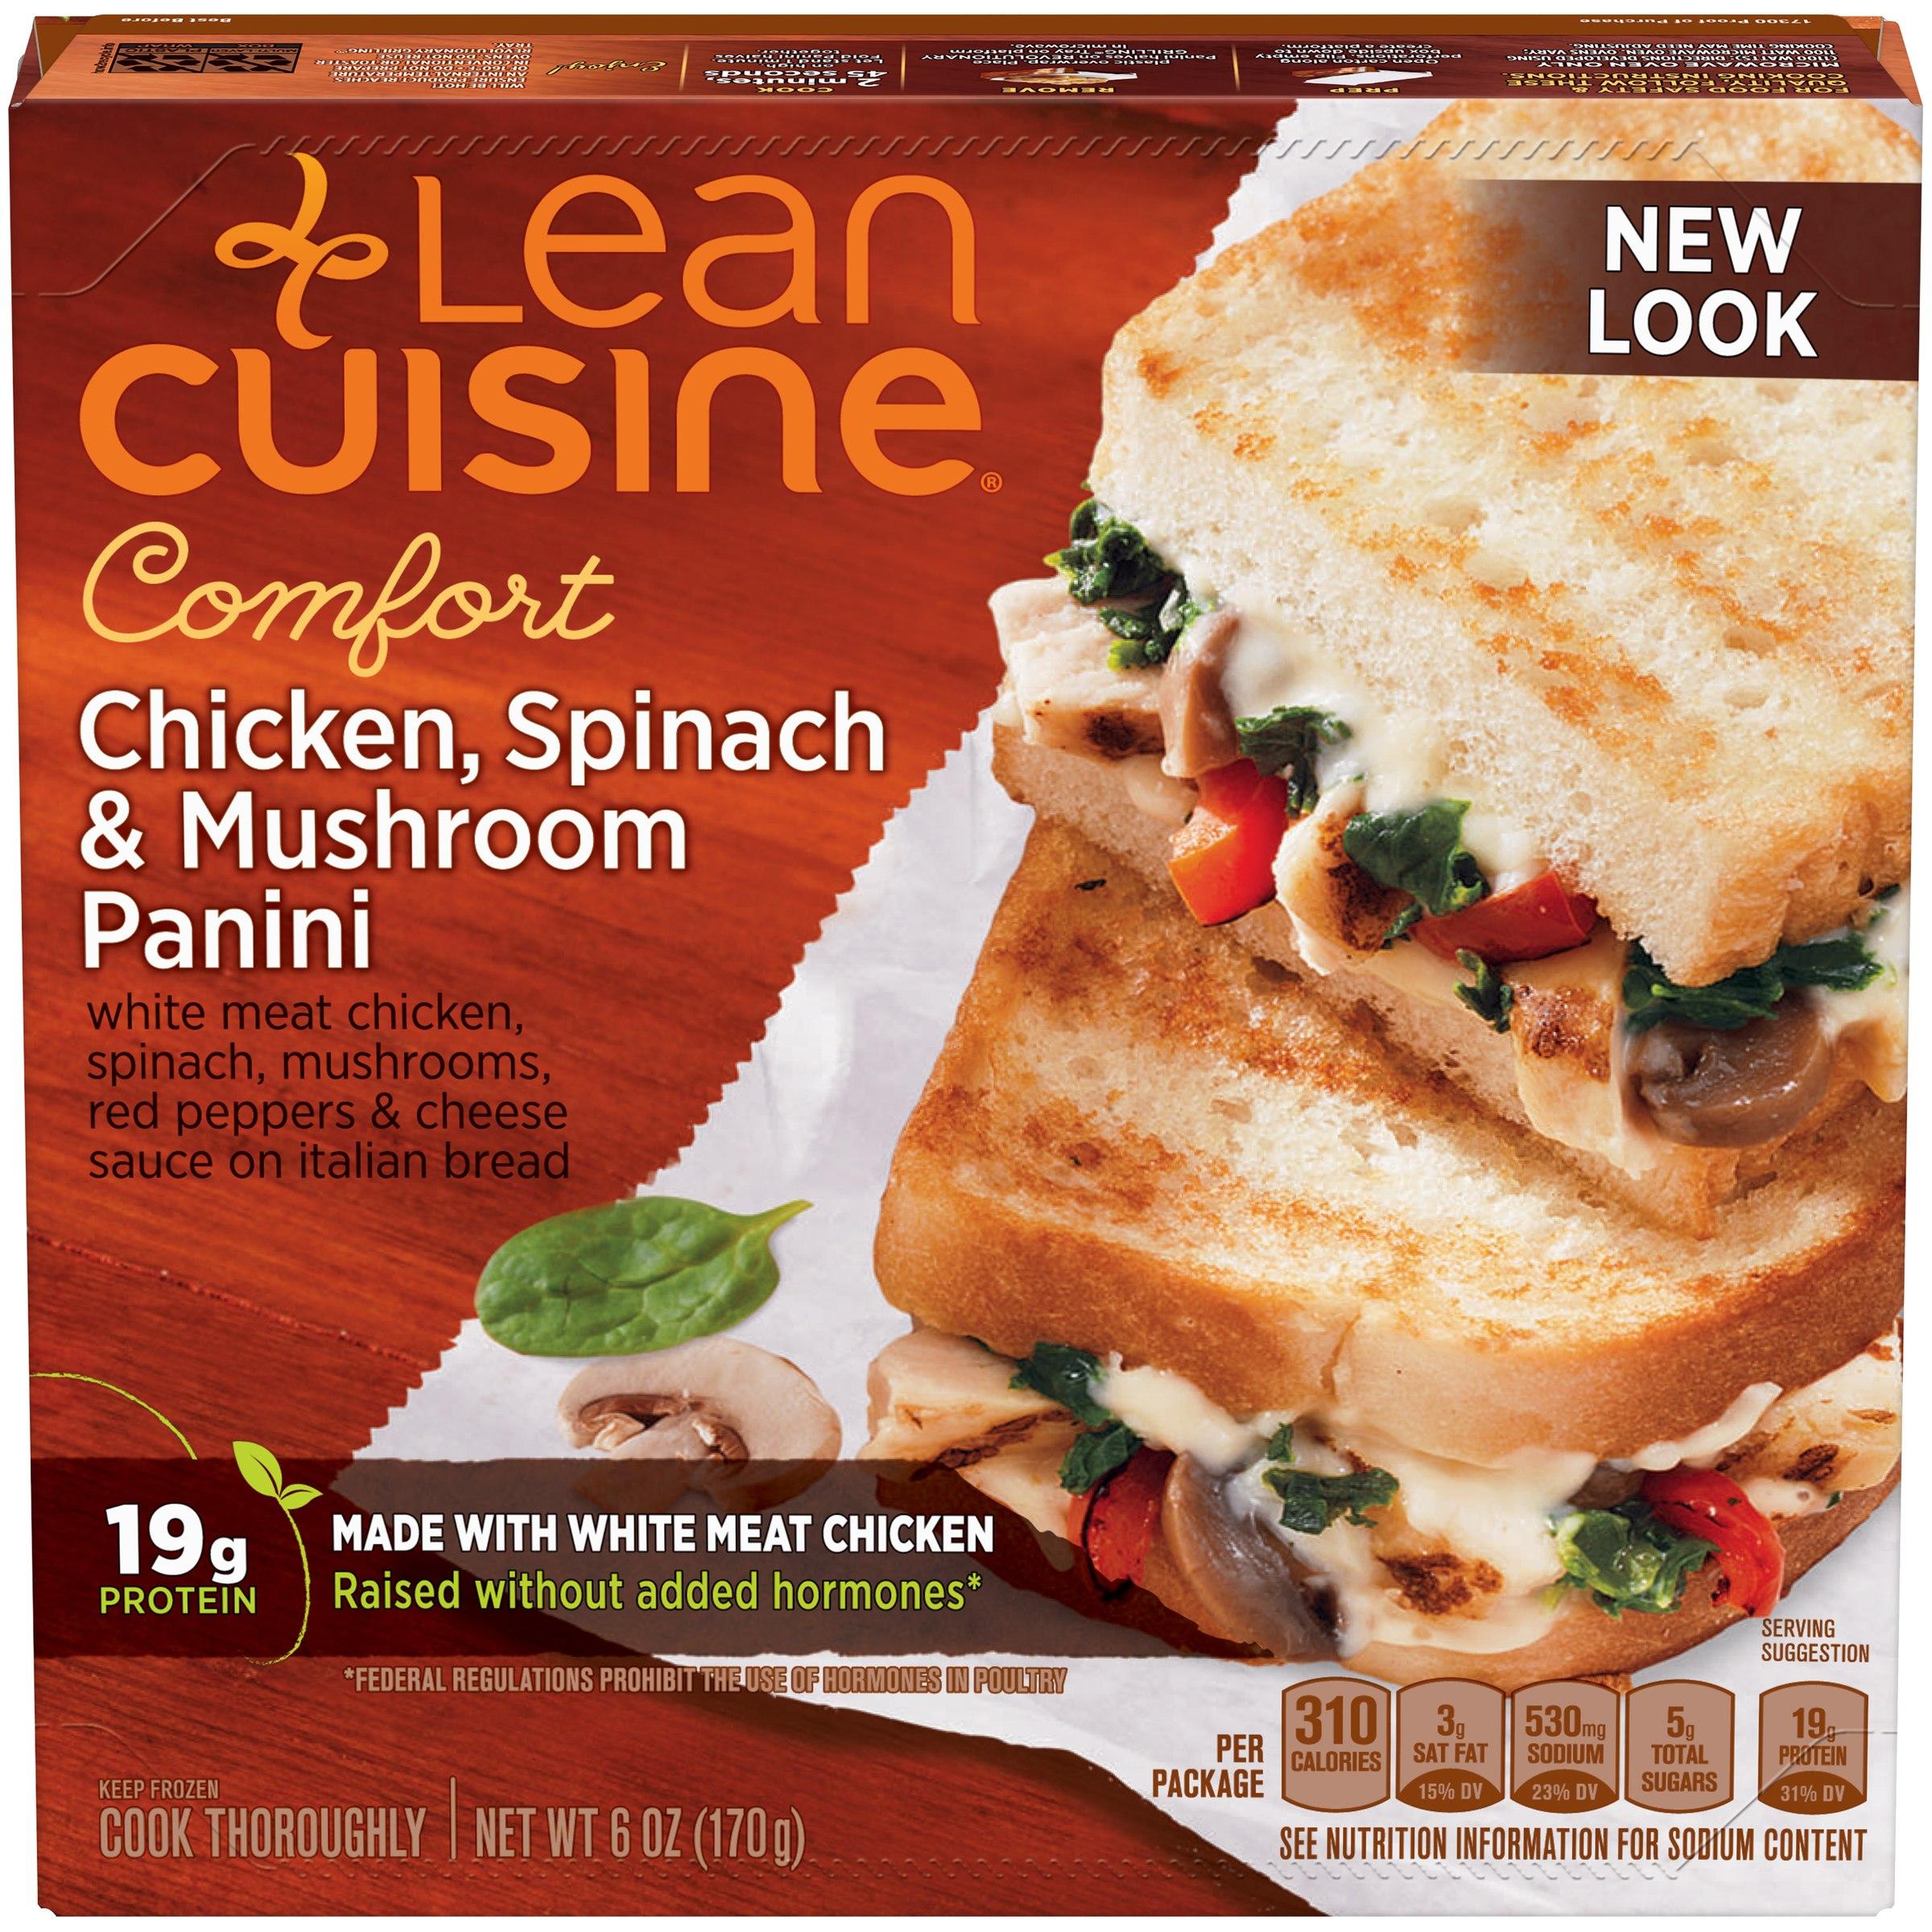 LEAN CUISINE COMFORT Chicken, Spinach & Mushroom Panini 6 oz. Box